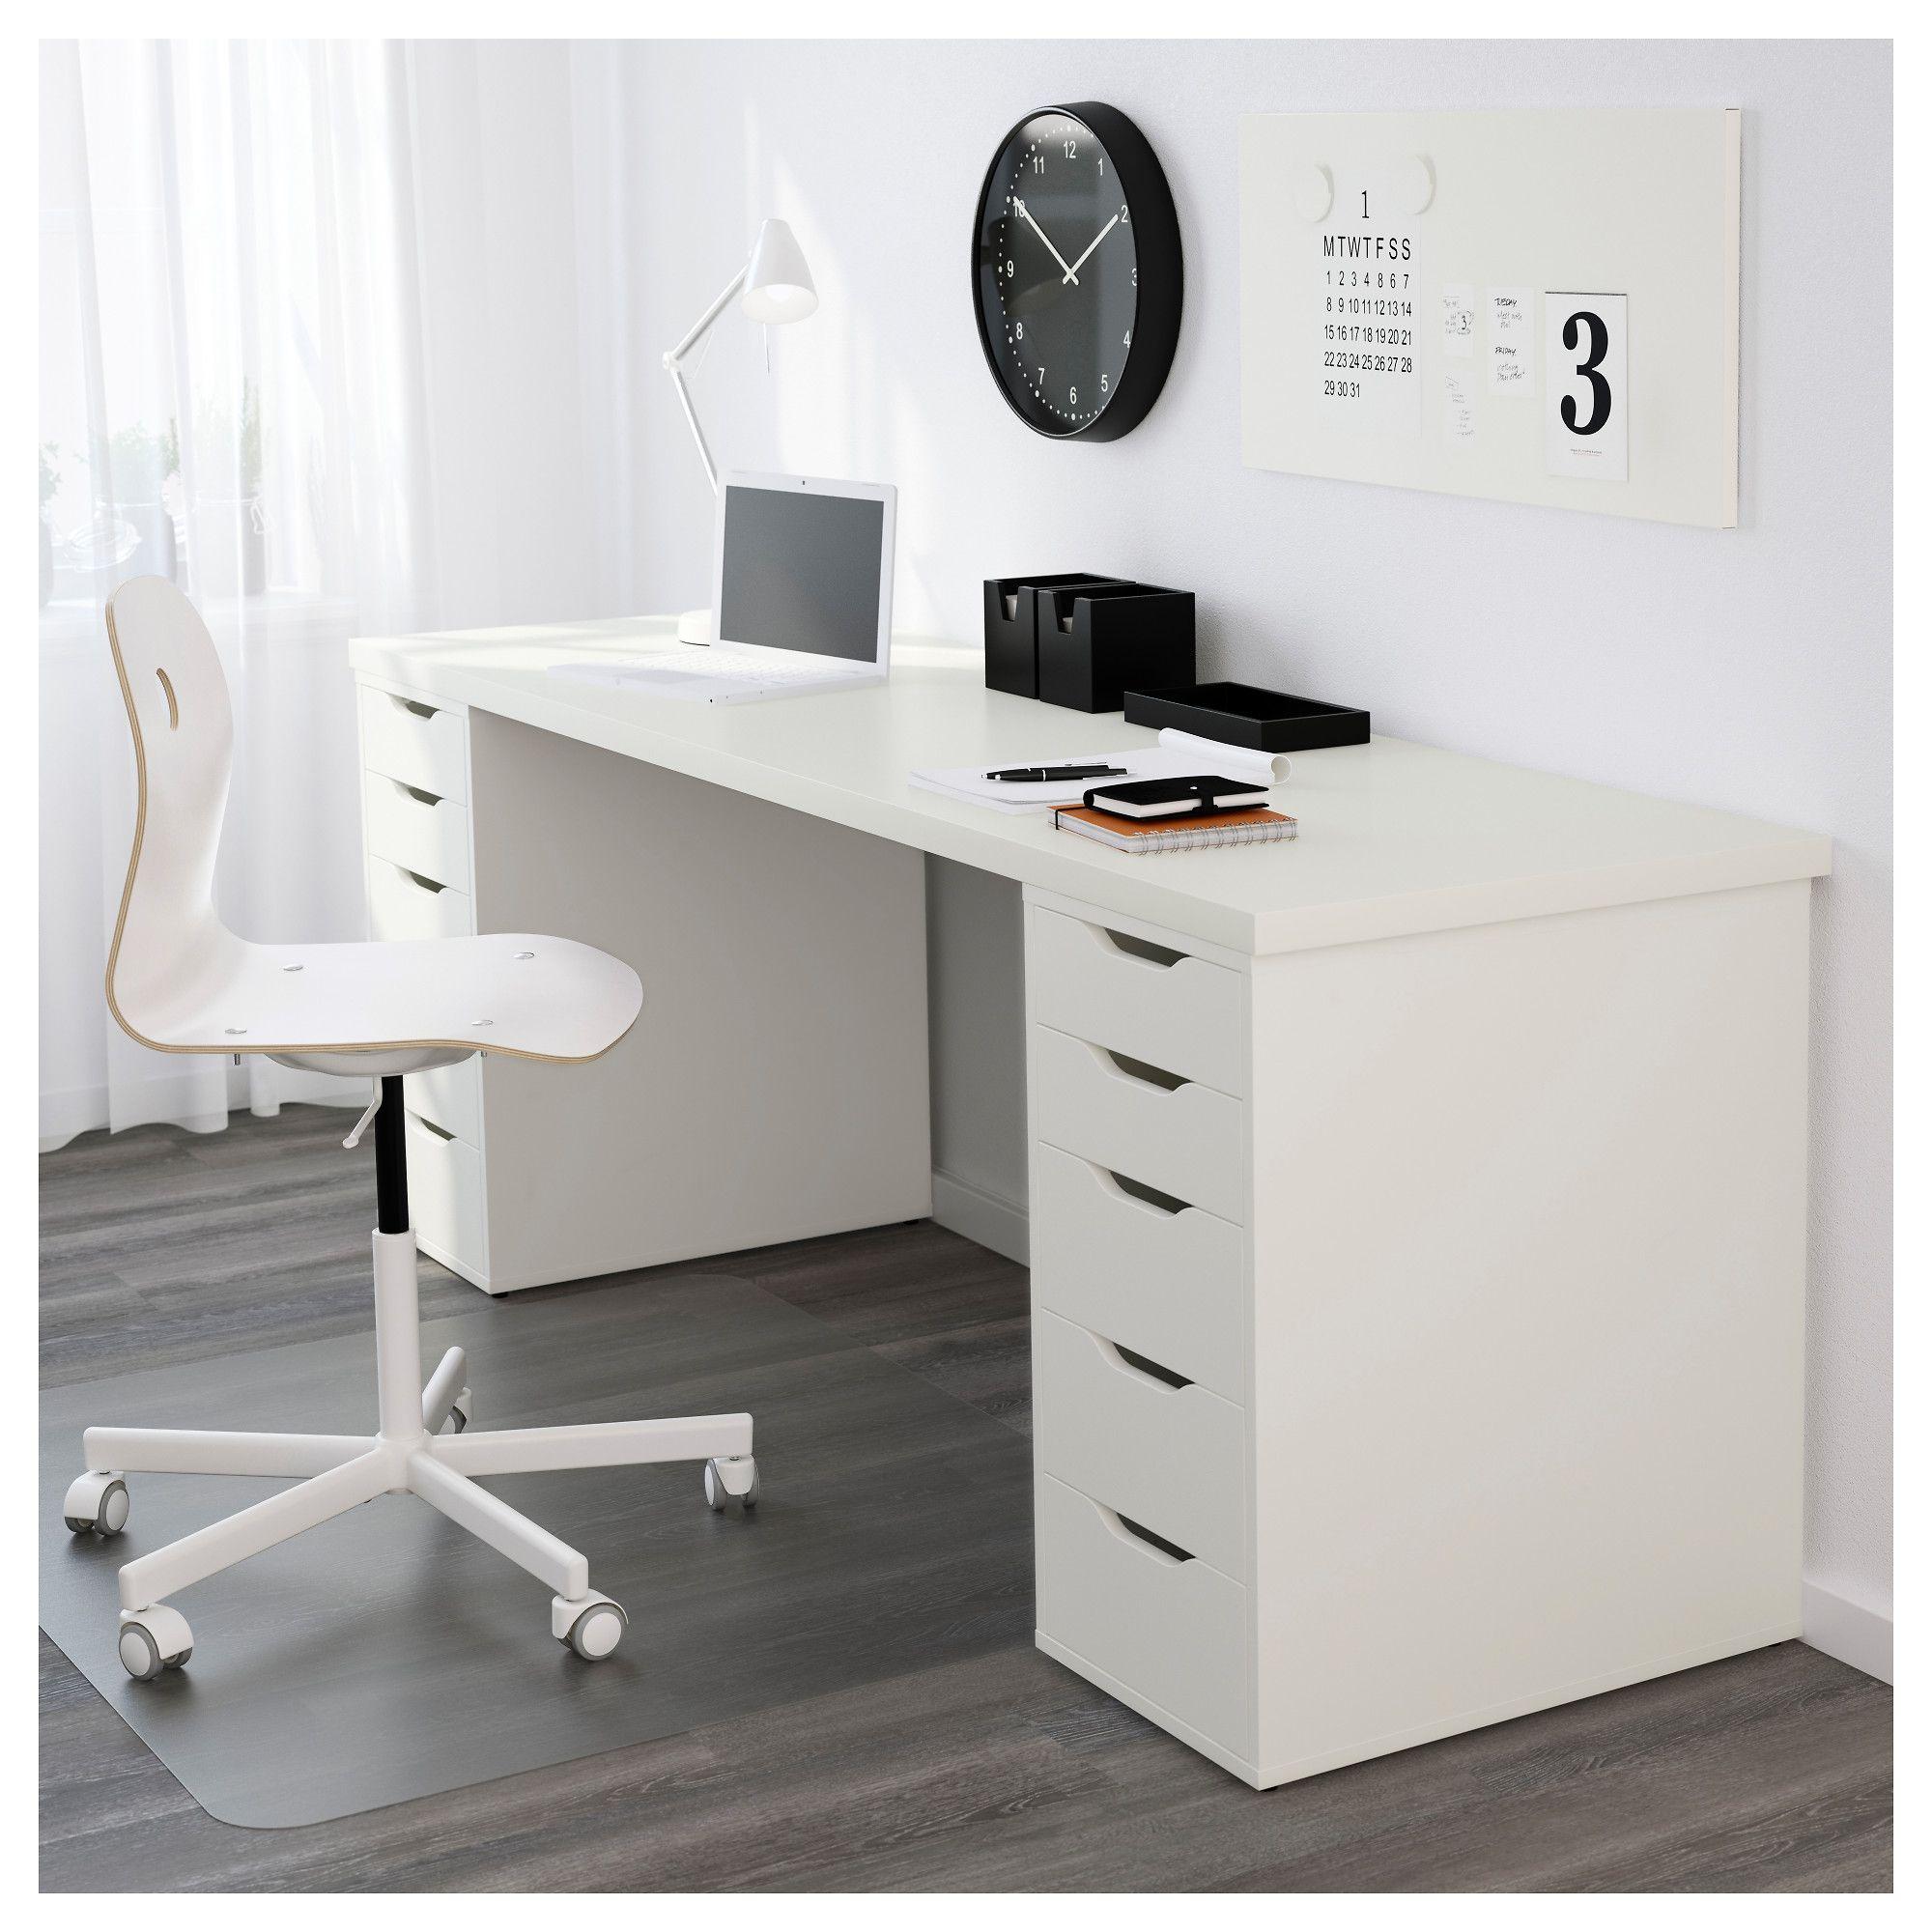 IKEA LINNMON White Tabletop Ikea table tops, Home office